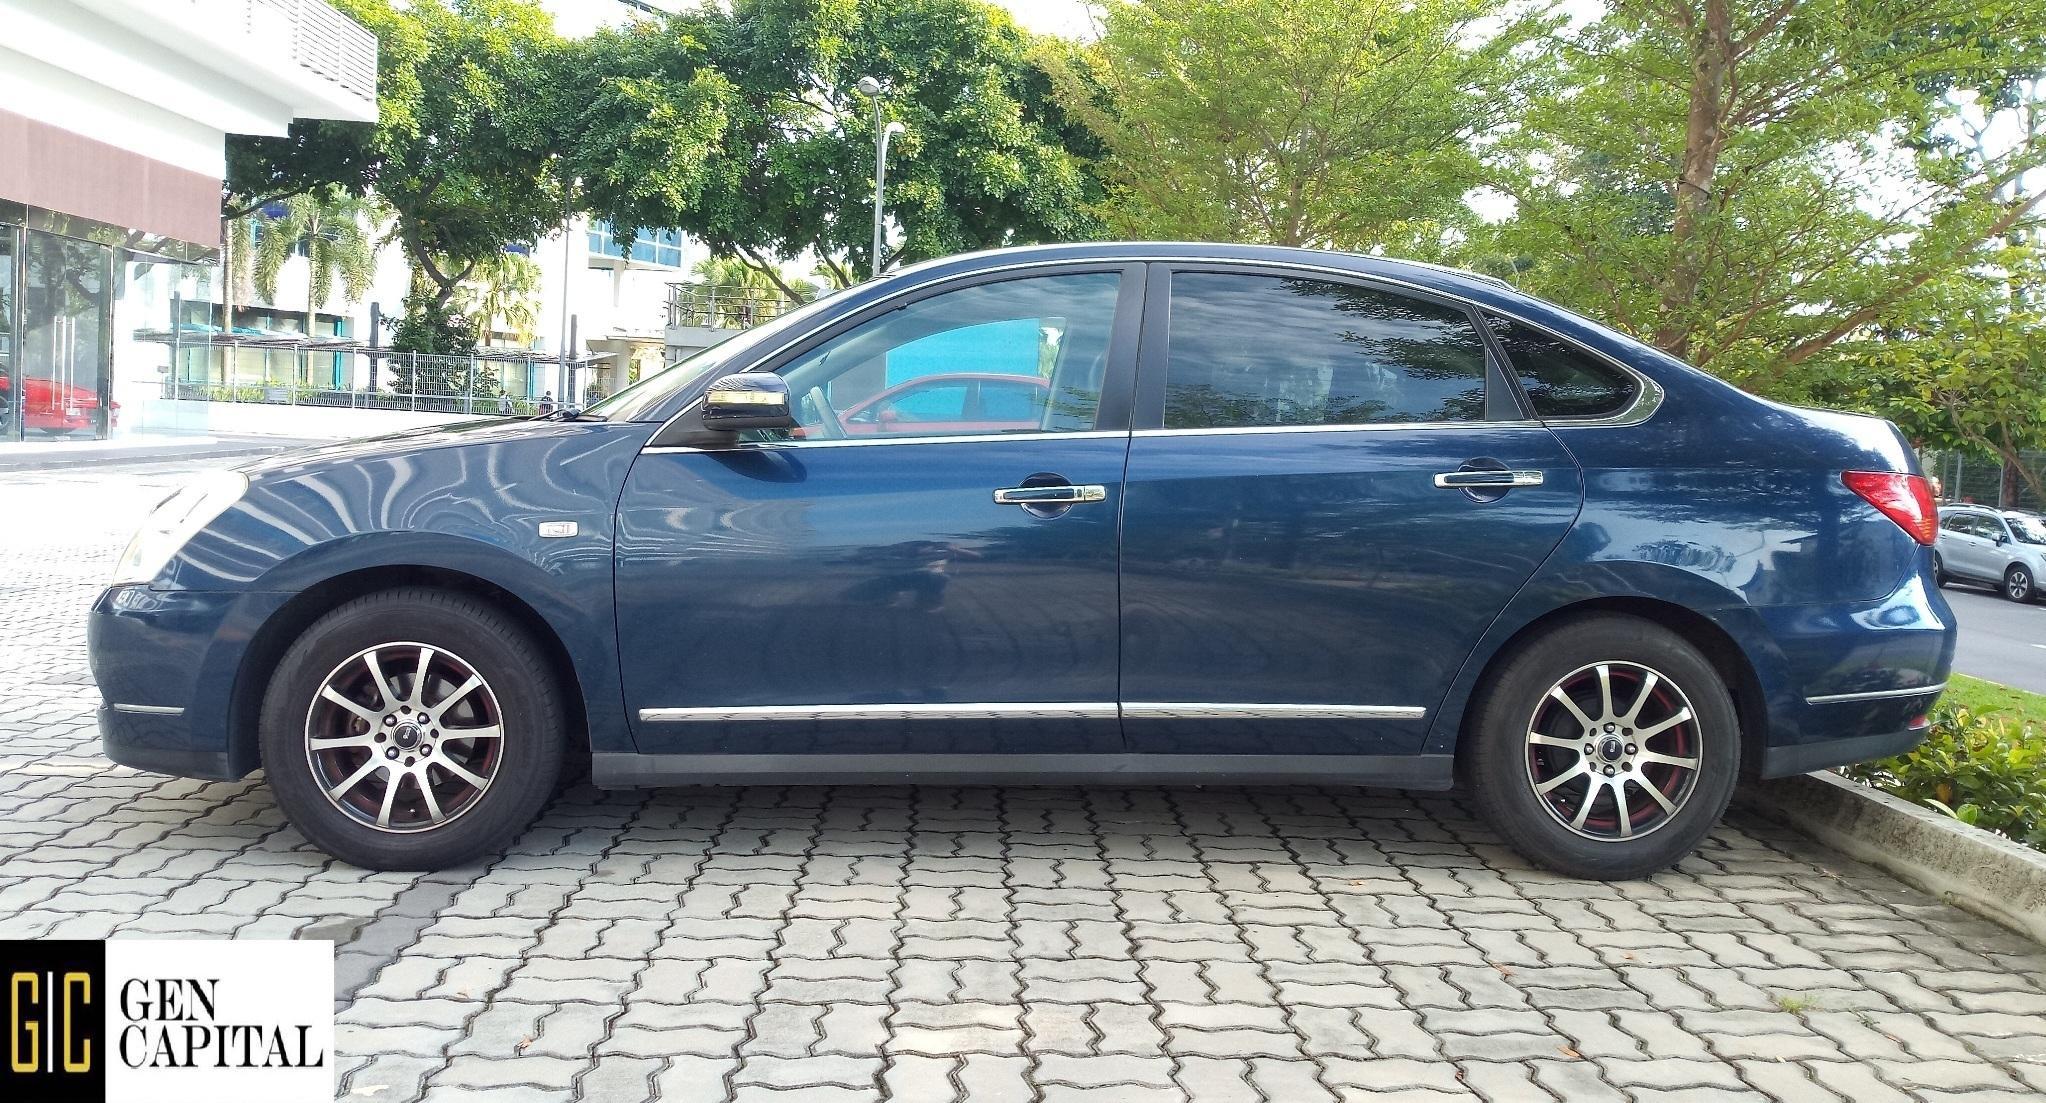 Nissan Sylphy 1.5A Grab Gojek Ryde Tada & Non PHV Car Rental